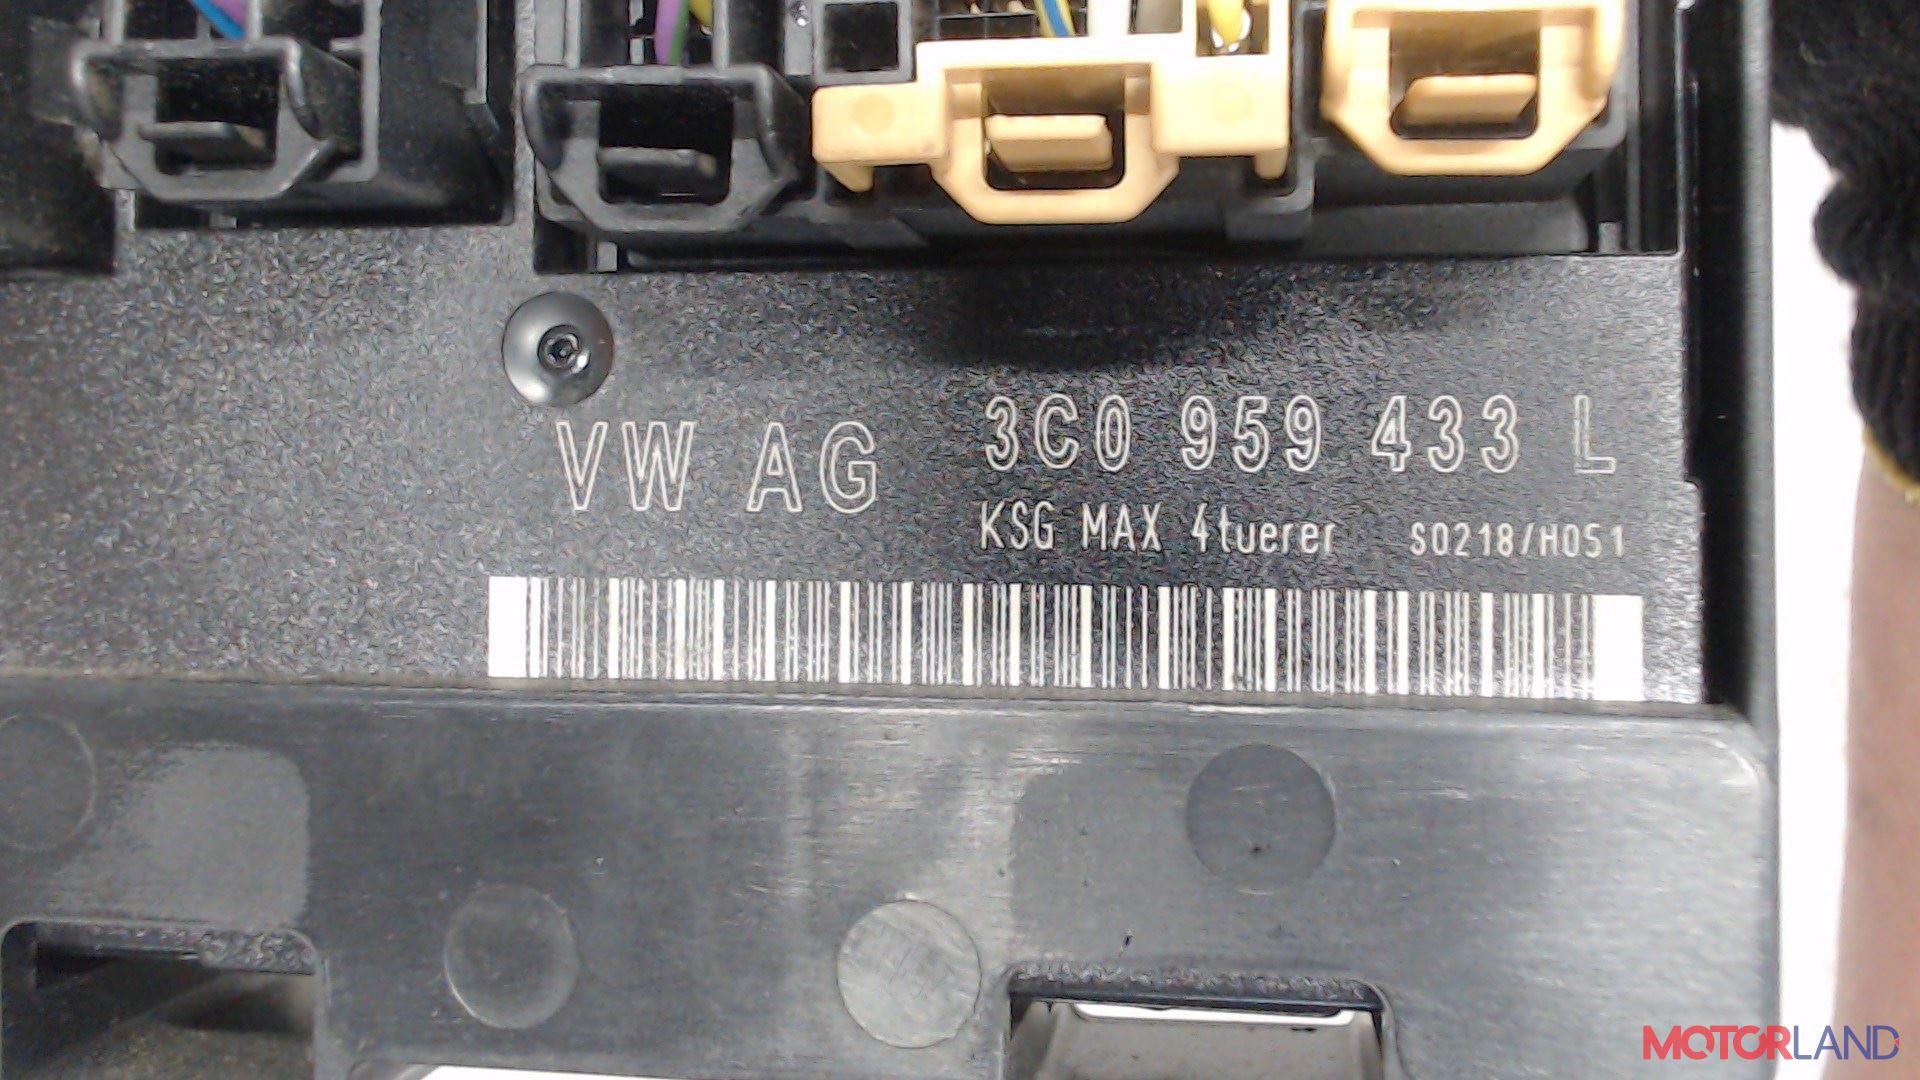 Блок управления (ЭБУ) Volkswagen Passat 6 2005-2010 3.2 л. 2006 AXZ б/у #3